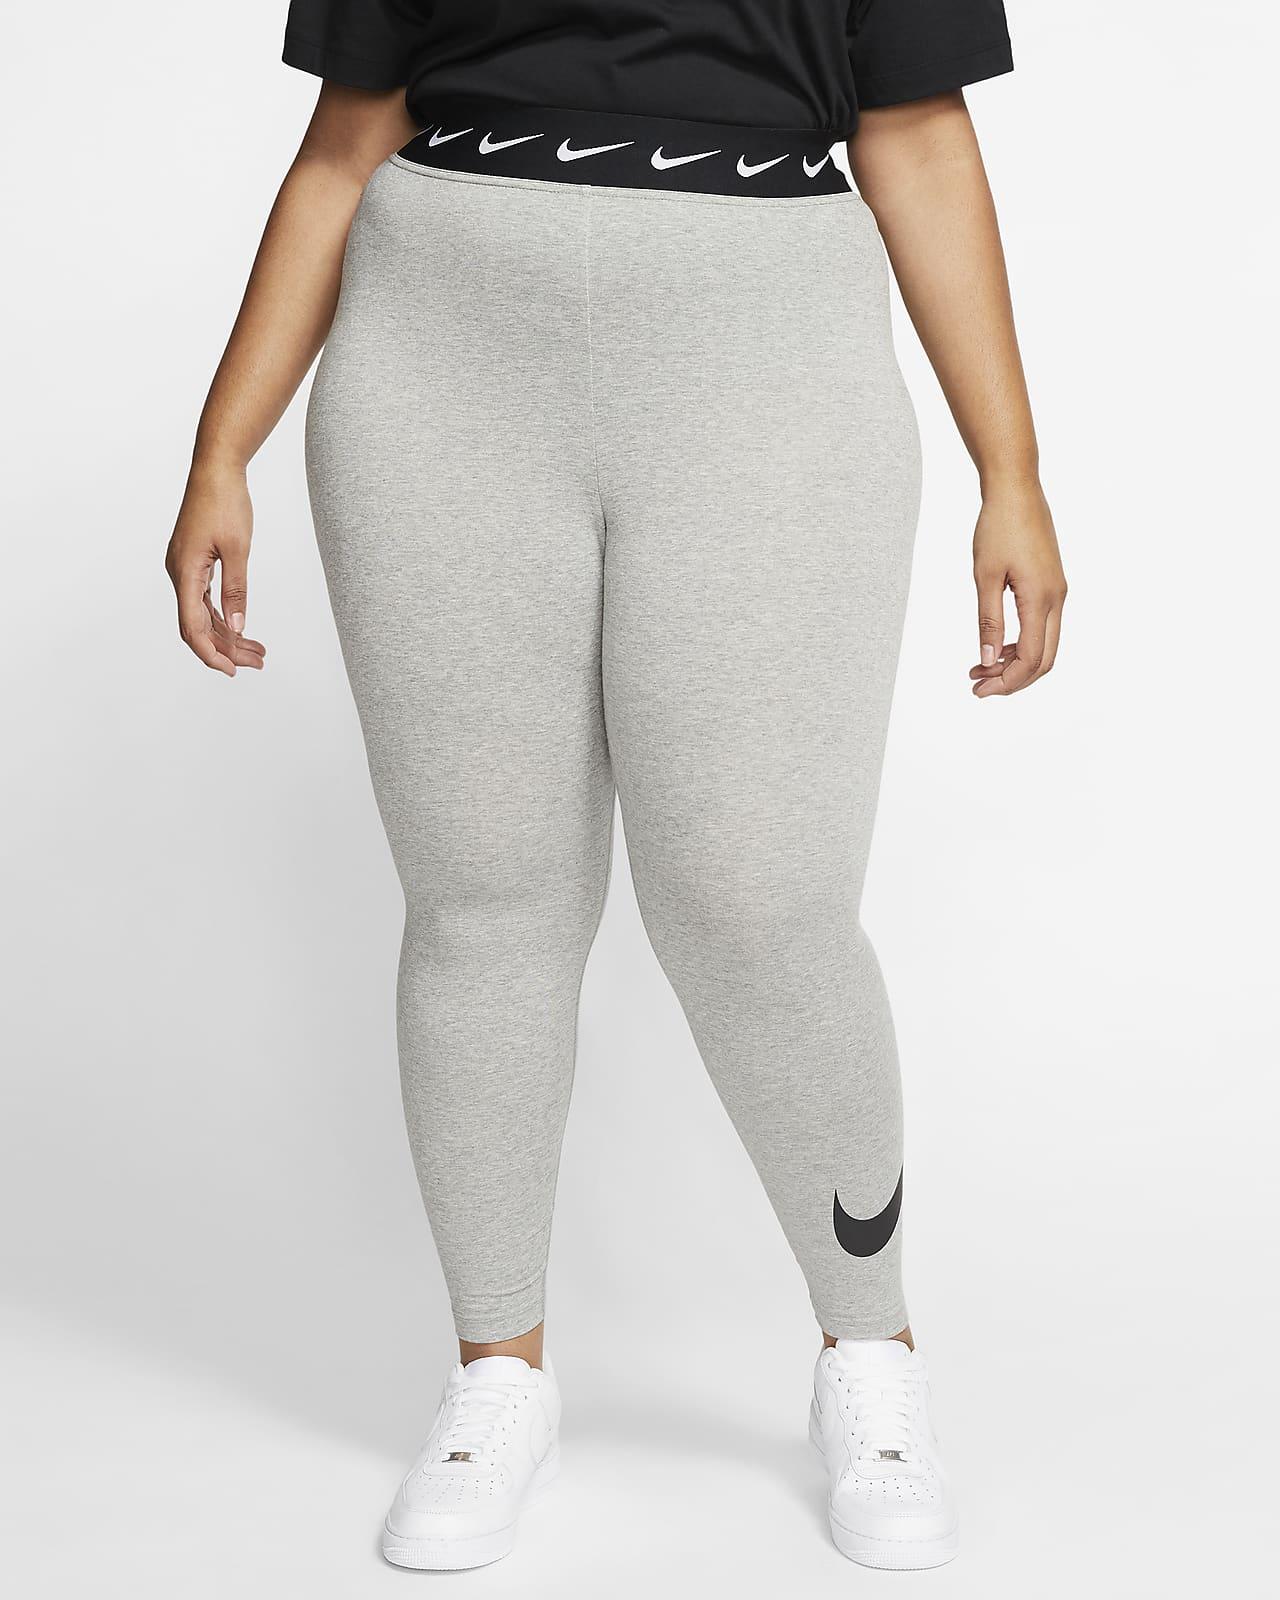 El otro día taza Educación moral  Nike Sportswear Club Women's High-Waisted Leggings (Plus Size). Nike.com